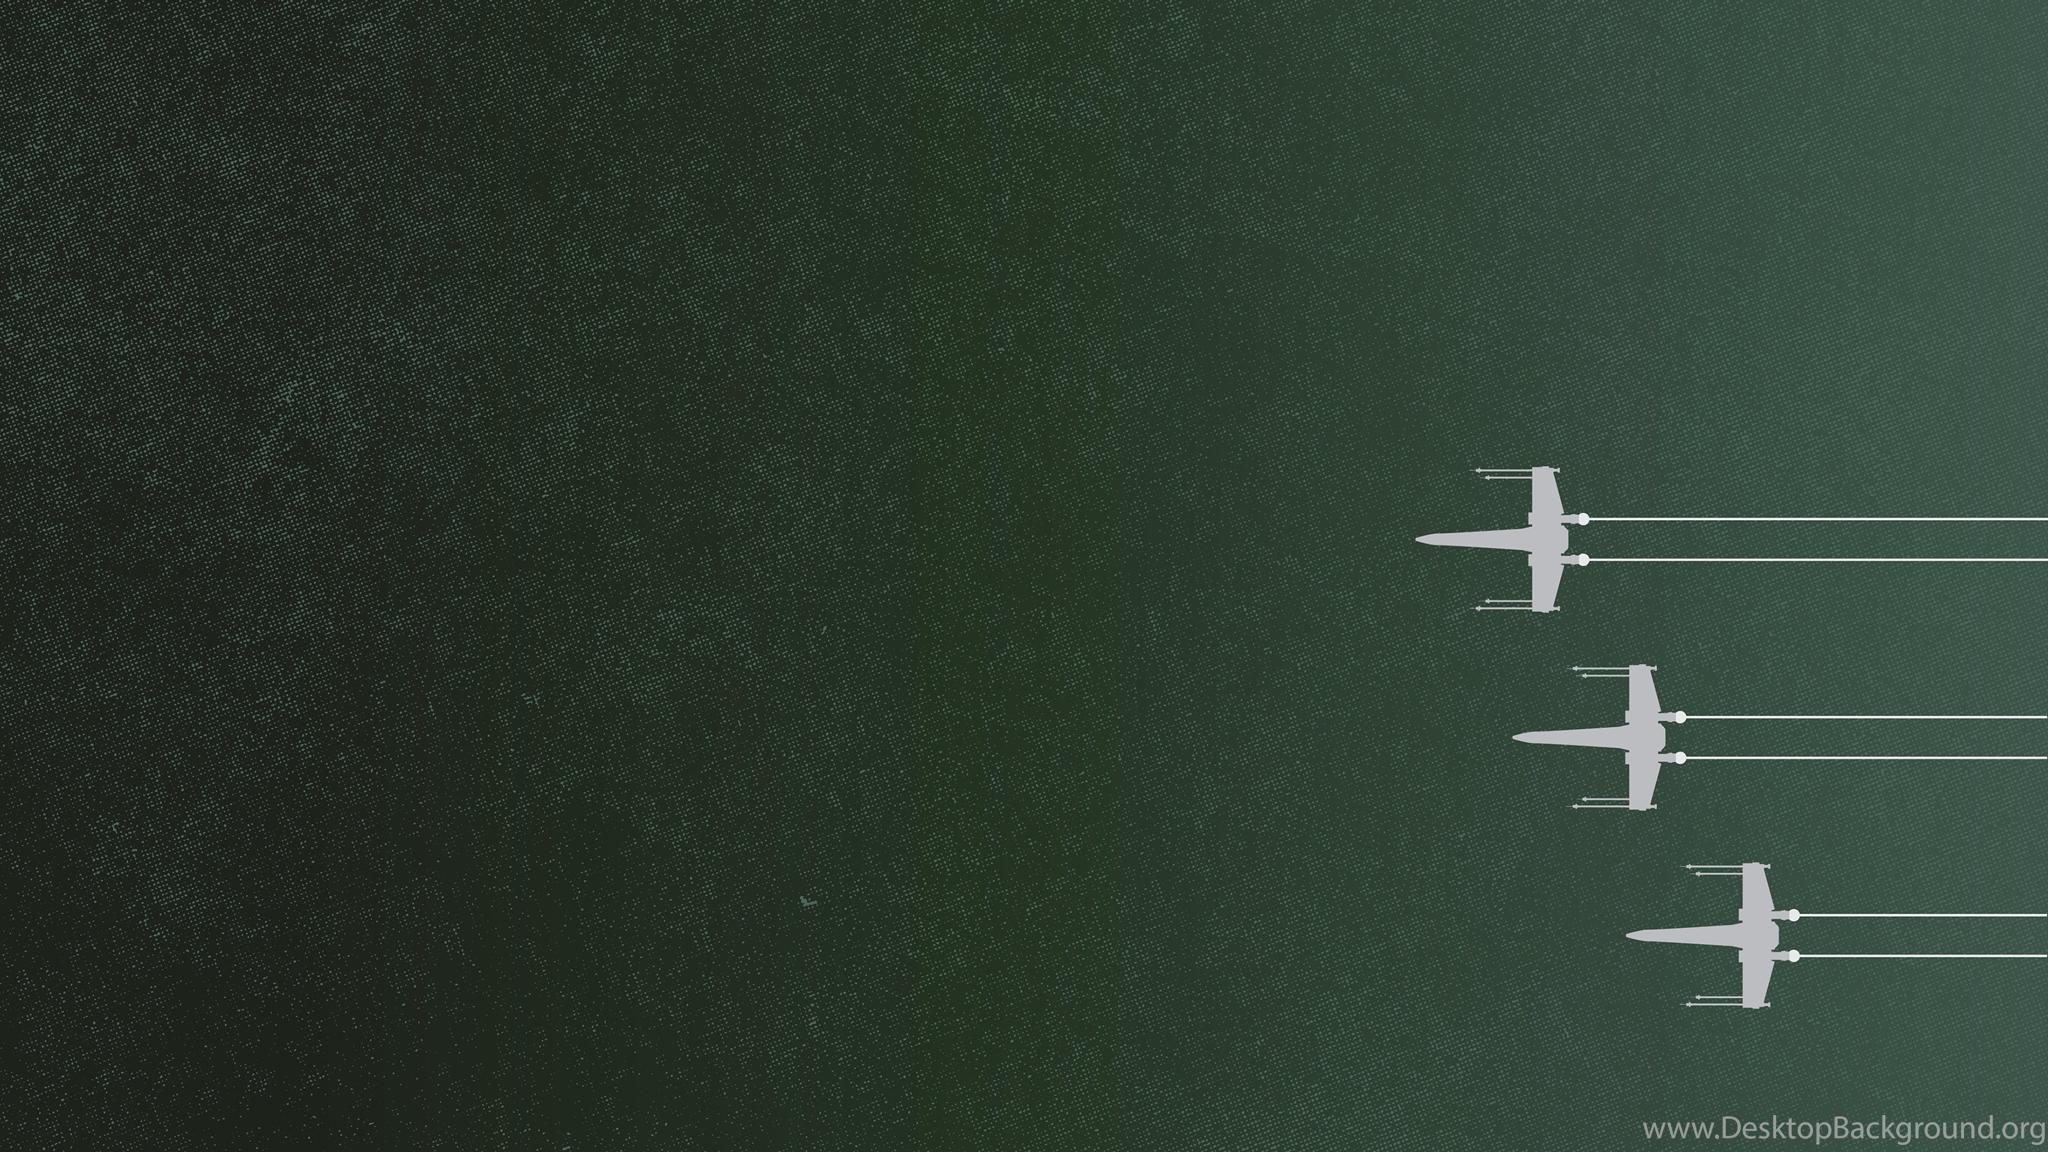 Star Wars X Wing Minimalism Wallpapers Hd Desktop And Mobile Desktop Background